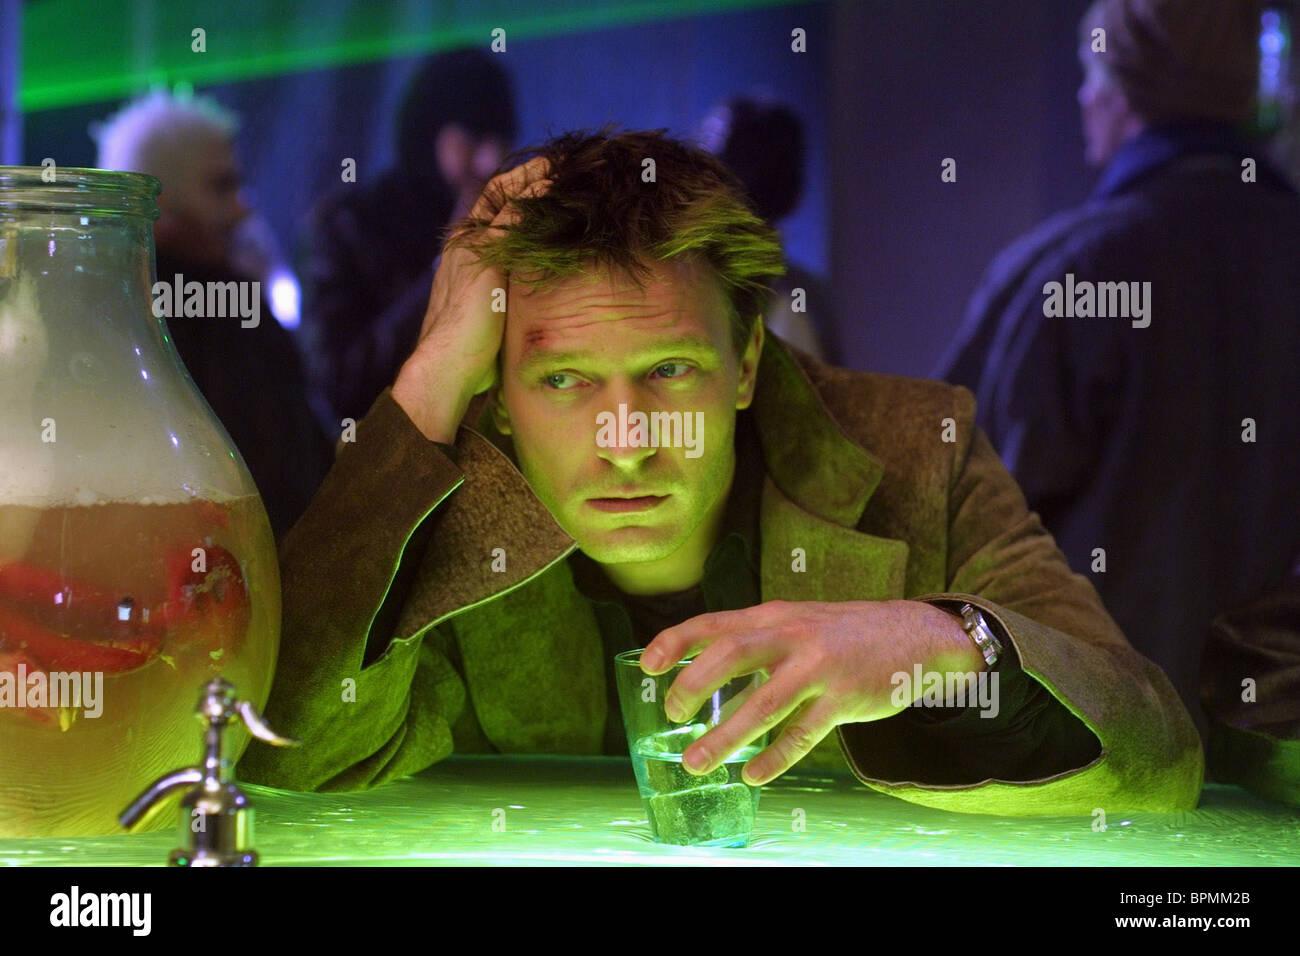 THOMAS KRETSCHMANN immortali; IMMORTEL (AD VITAM) (2004) Immagini Stock